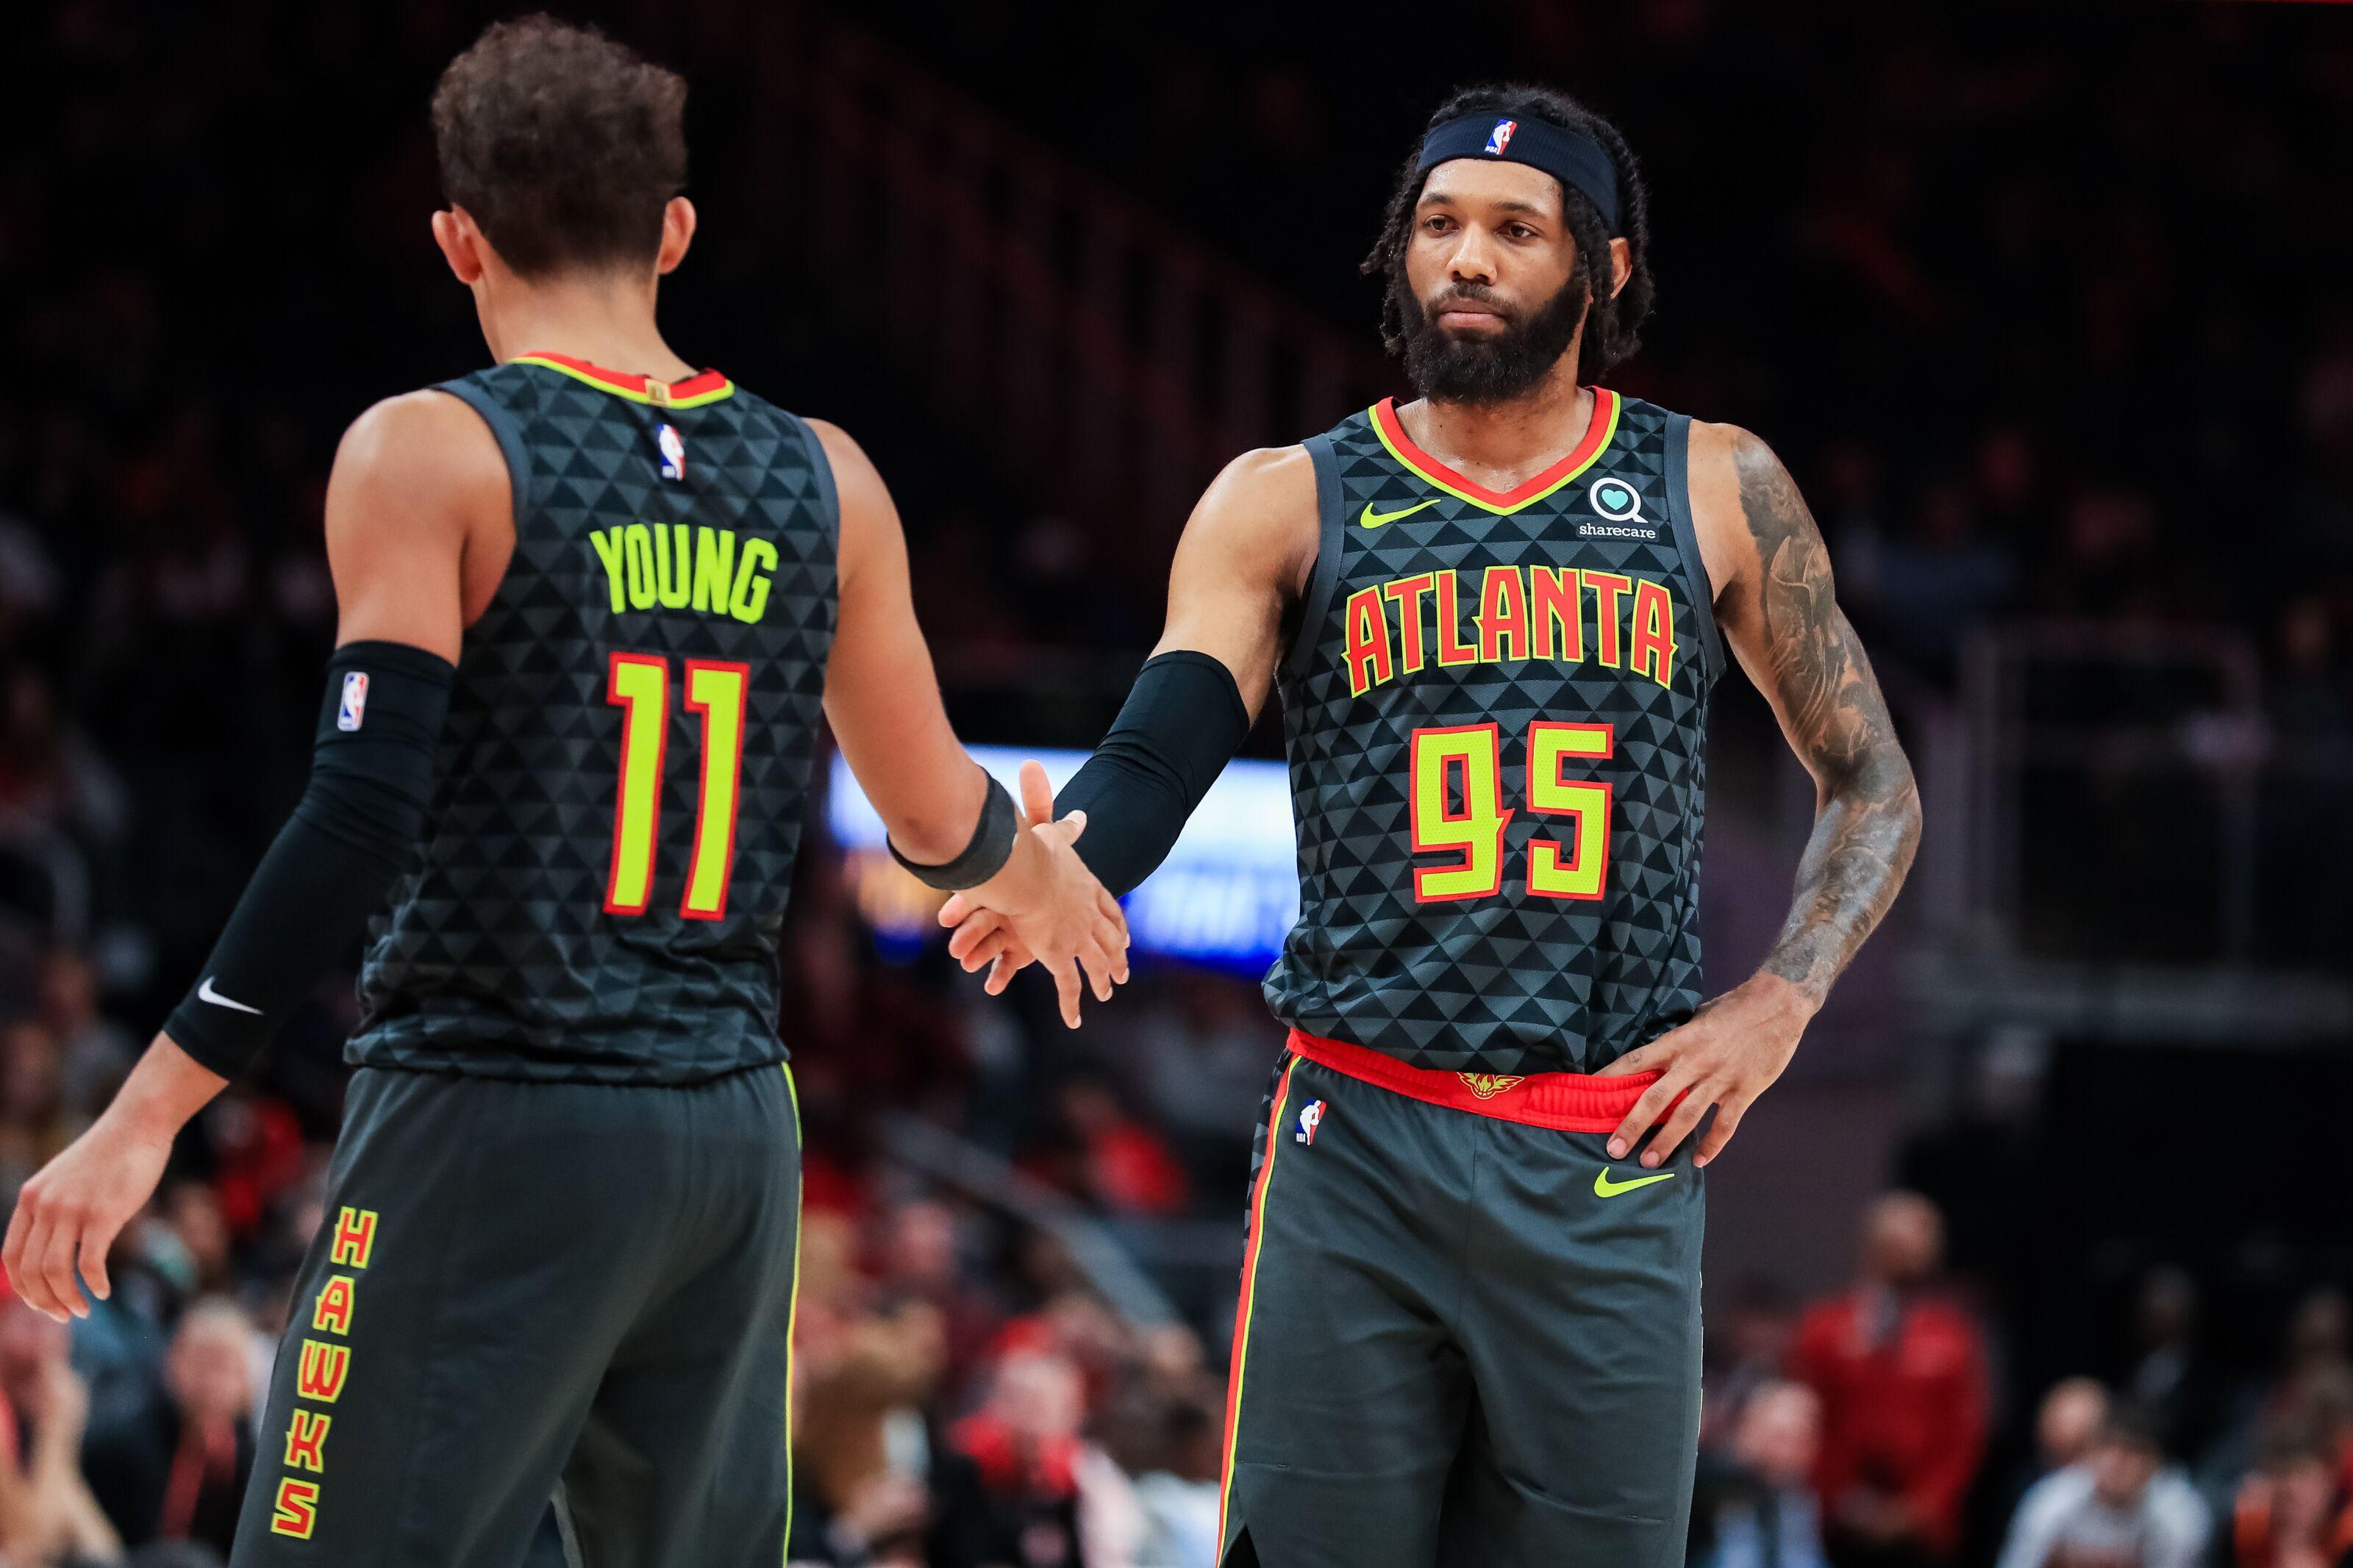 Atlanta Hawks' Player Awards for November